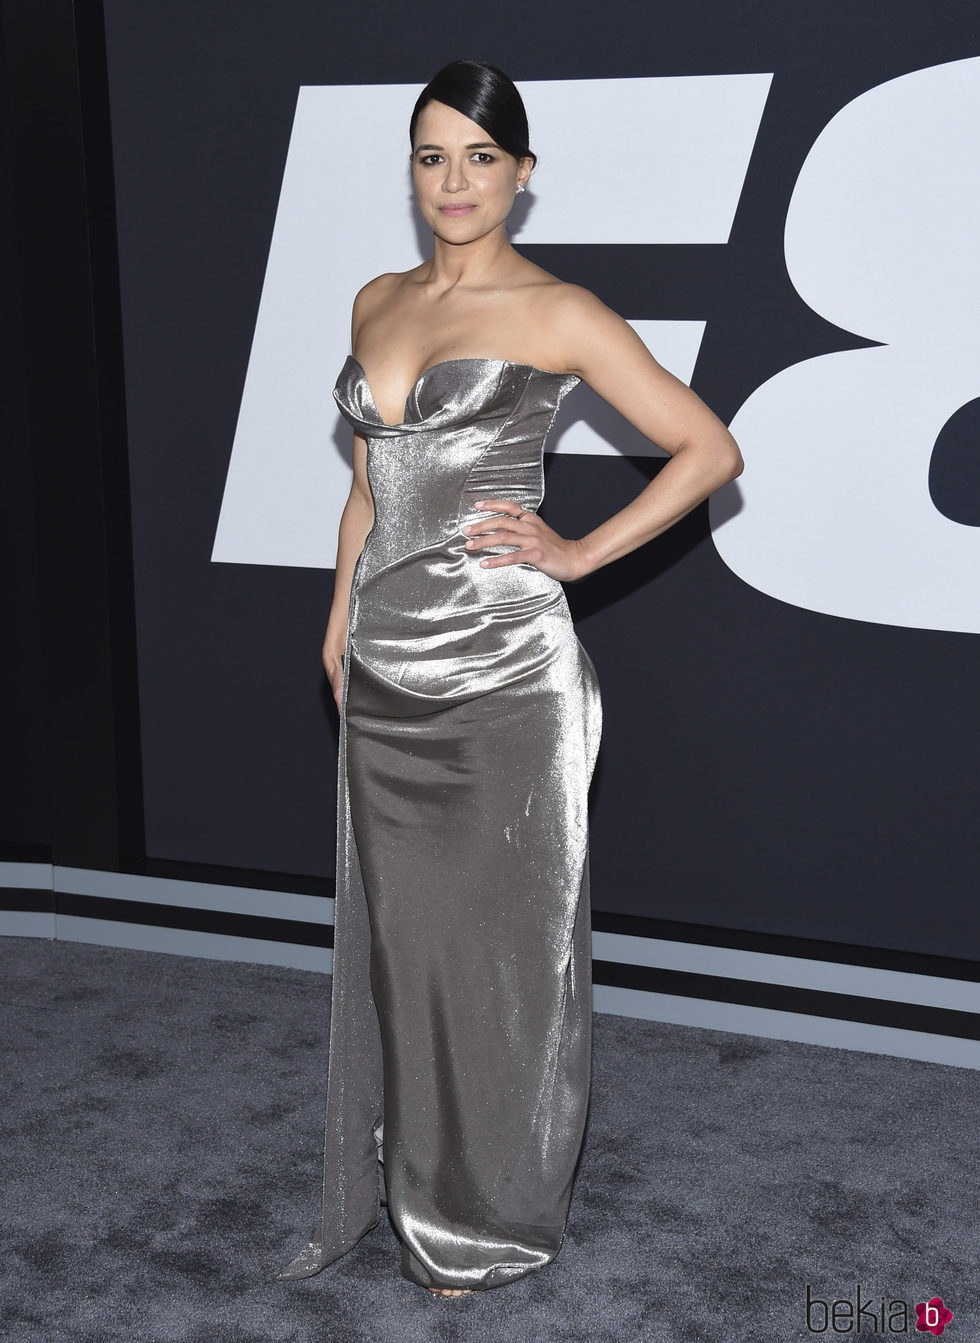 Michelle Rodriguez en la Premiere de 'Fast & Furious 8' en Nueva York